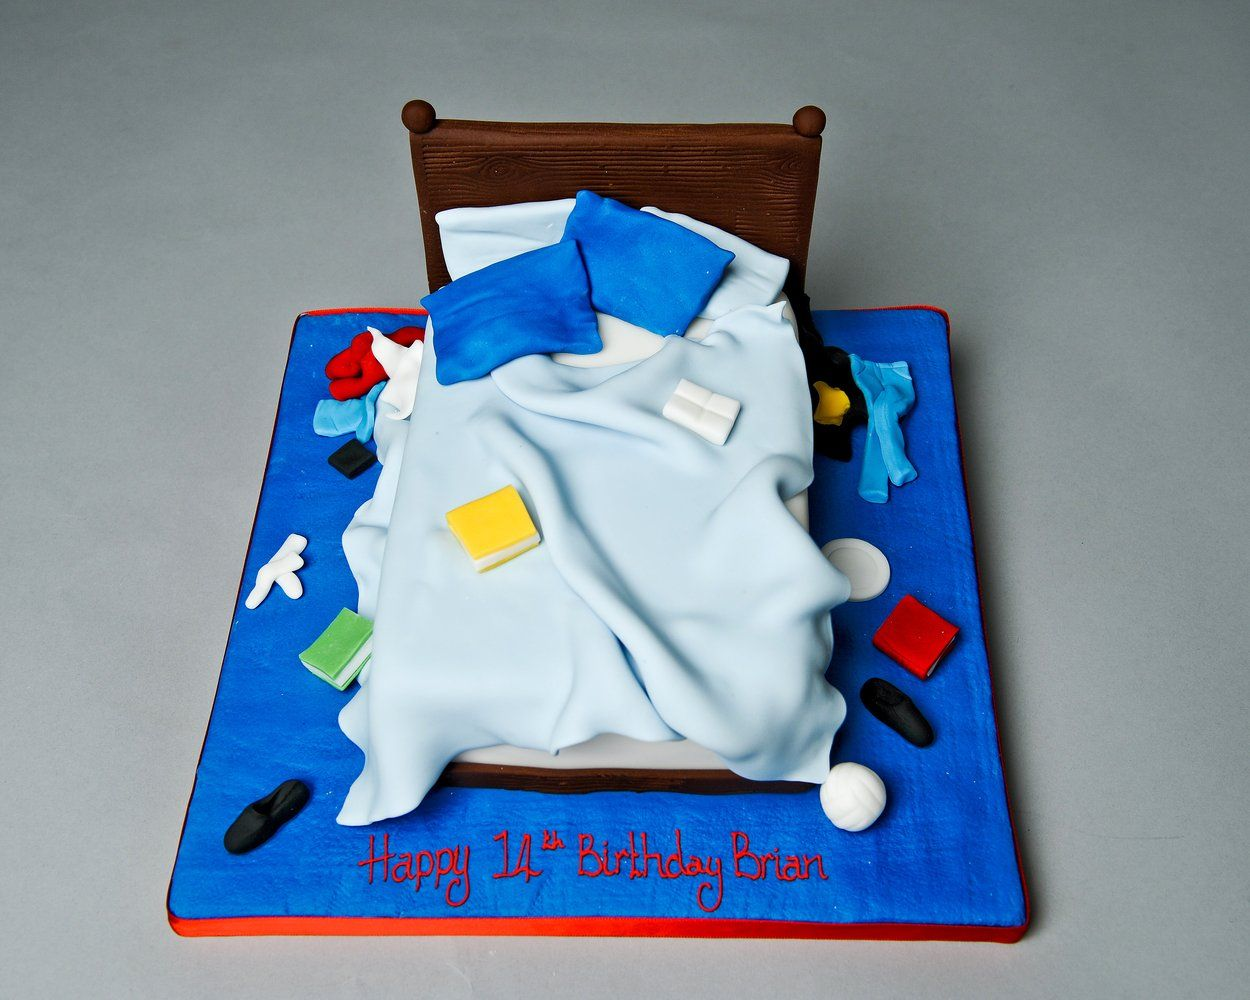 Pin By Heather Rice On Cakes Cake Cupcake Birthday Cake